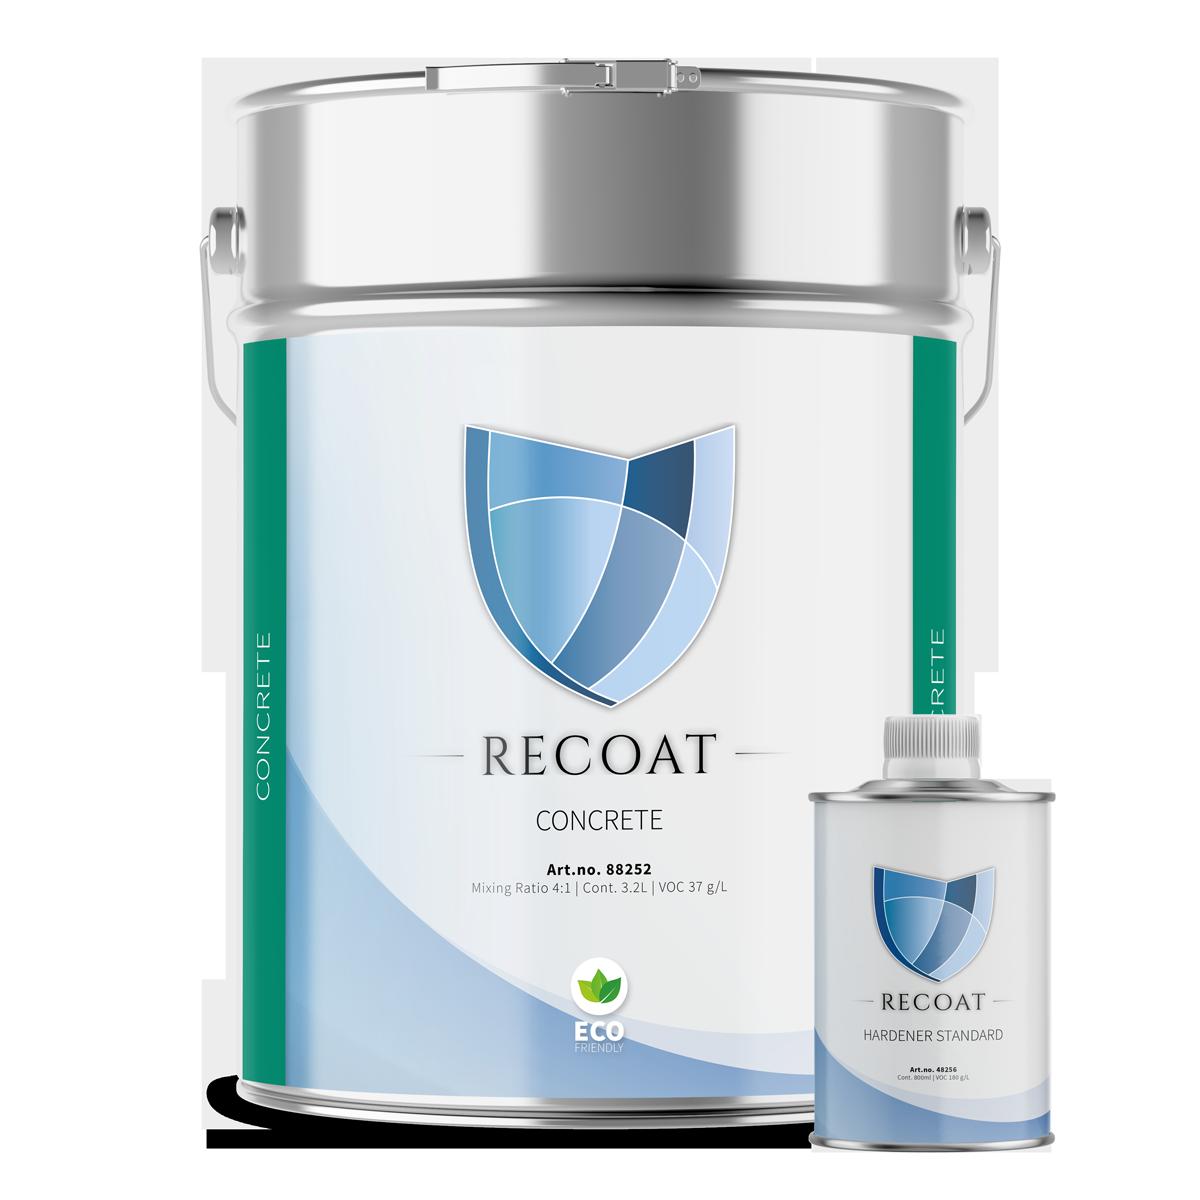 Recoat Concrete 5 liter